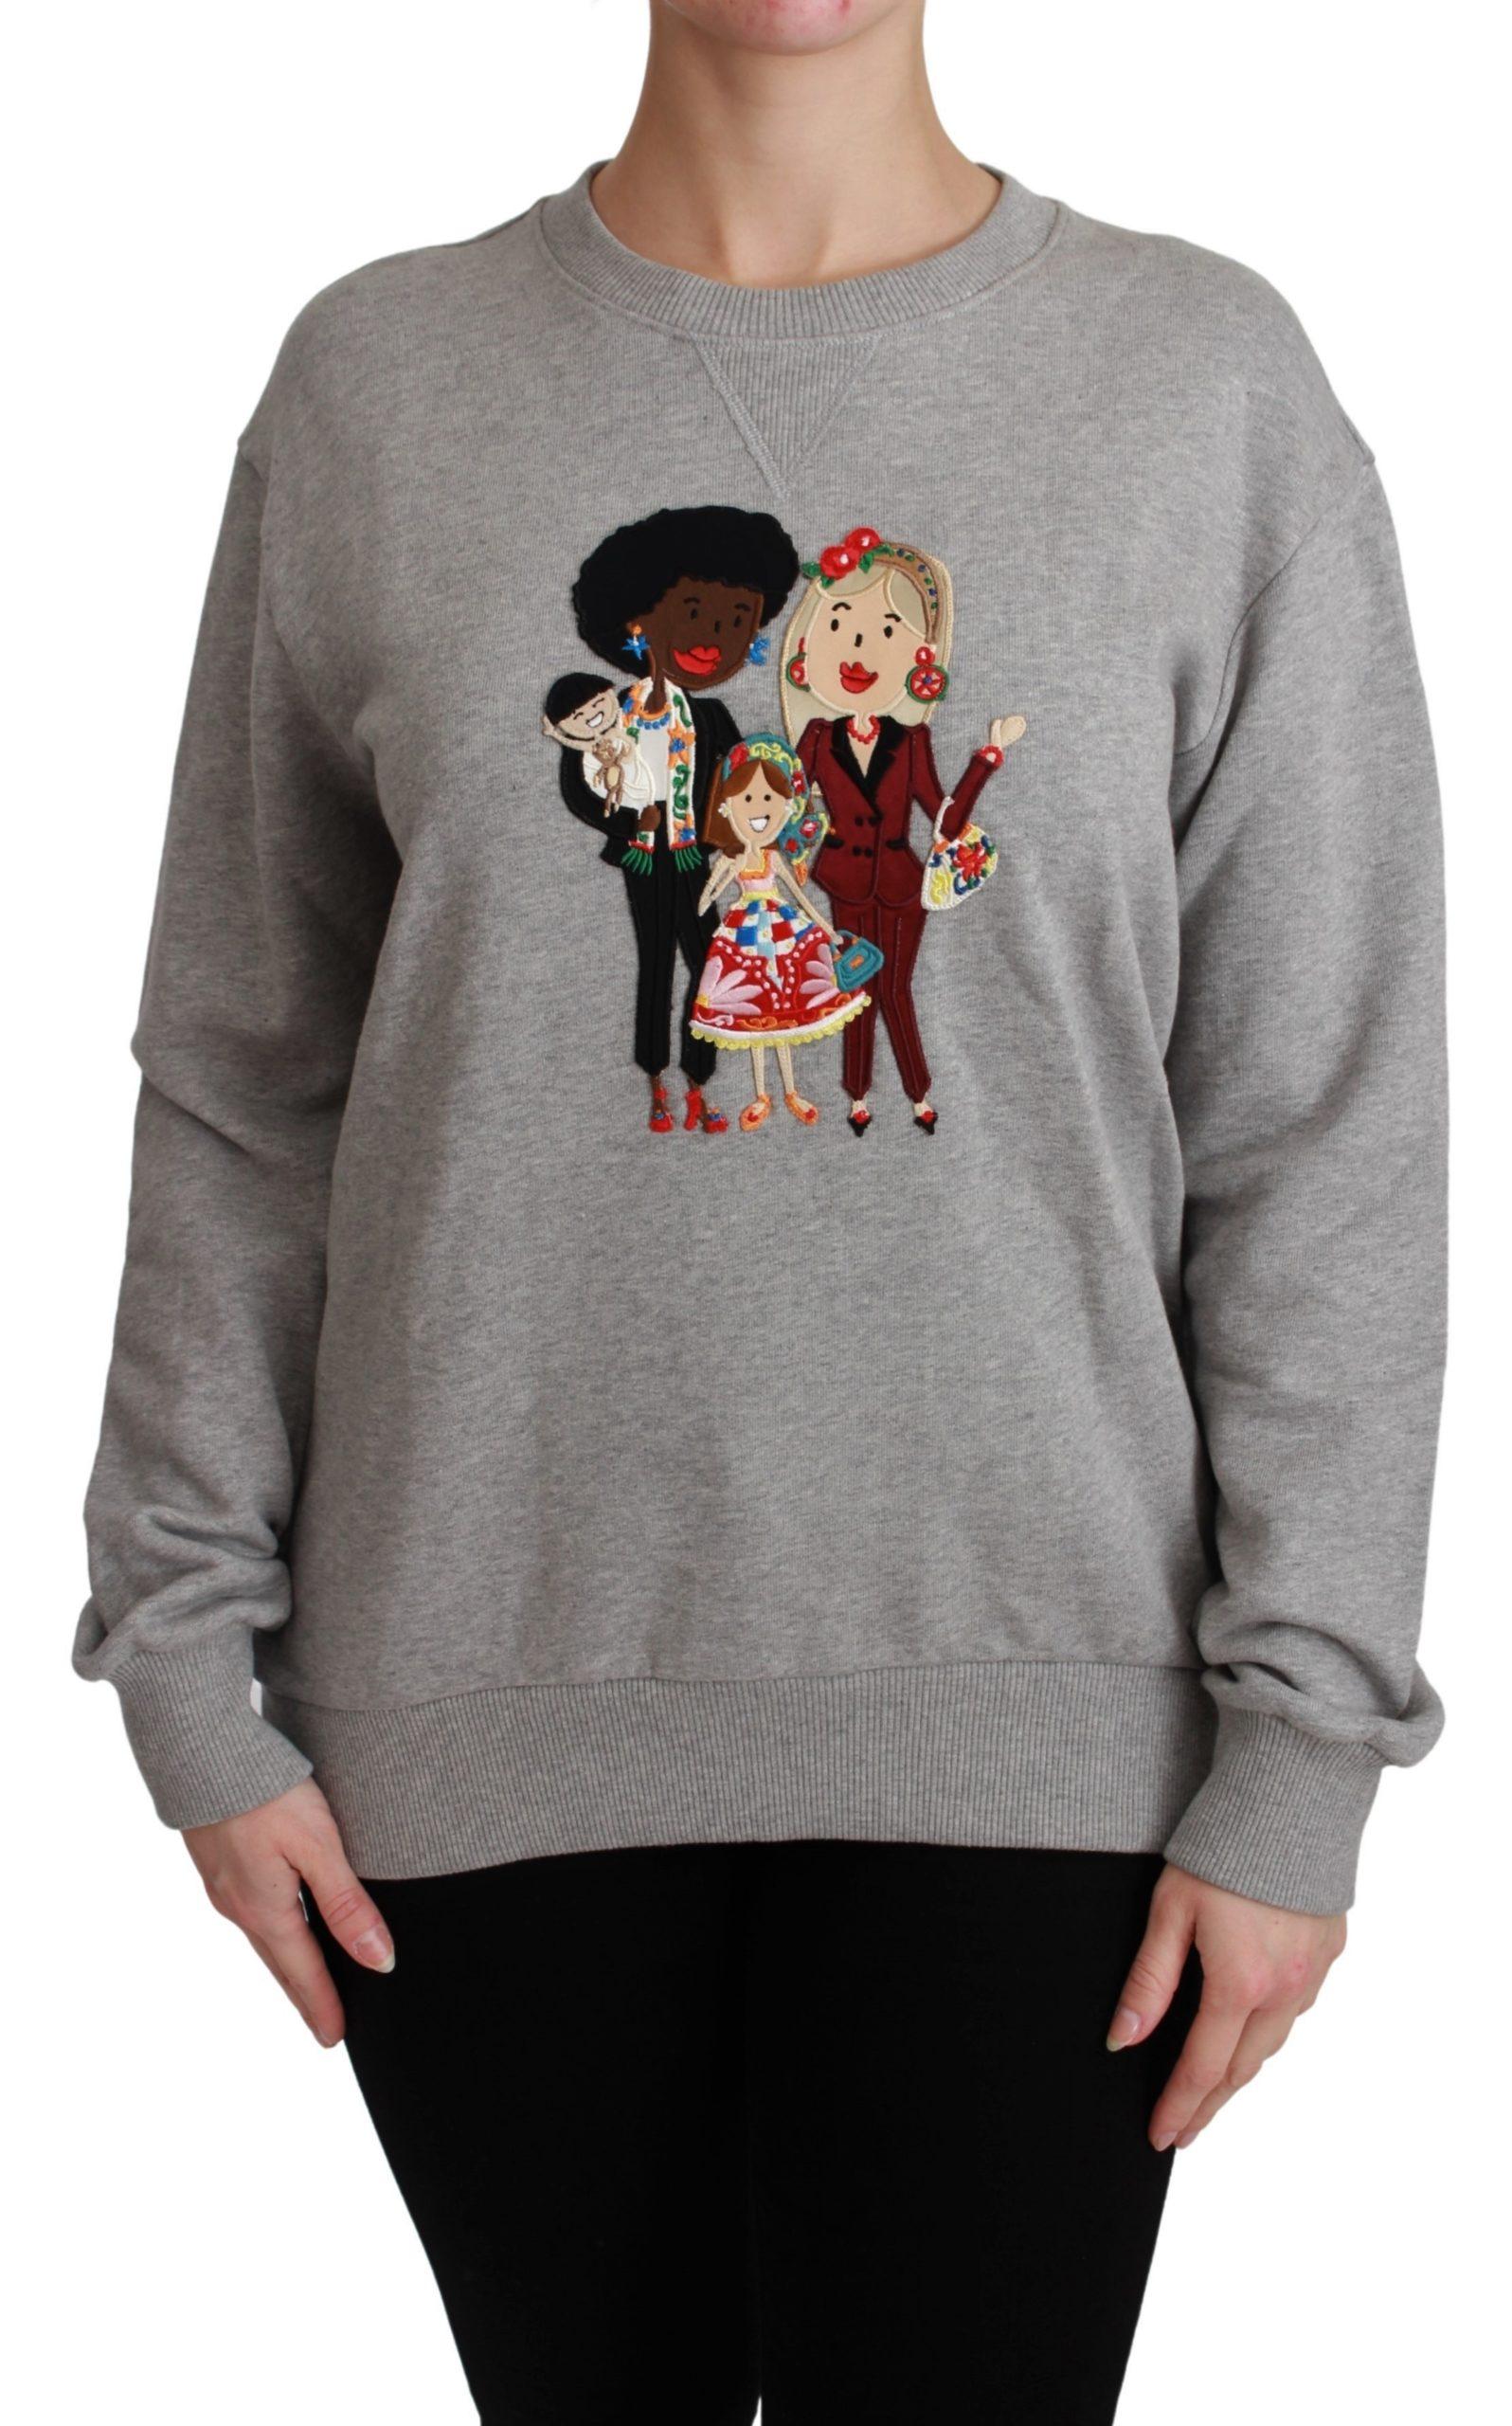 Dolce & Gabbana Women's #dgfamily Cotton Pullover Sweater Gray TSH4558 - IT38|XS